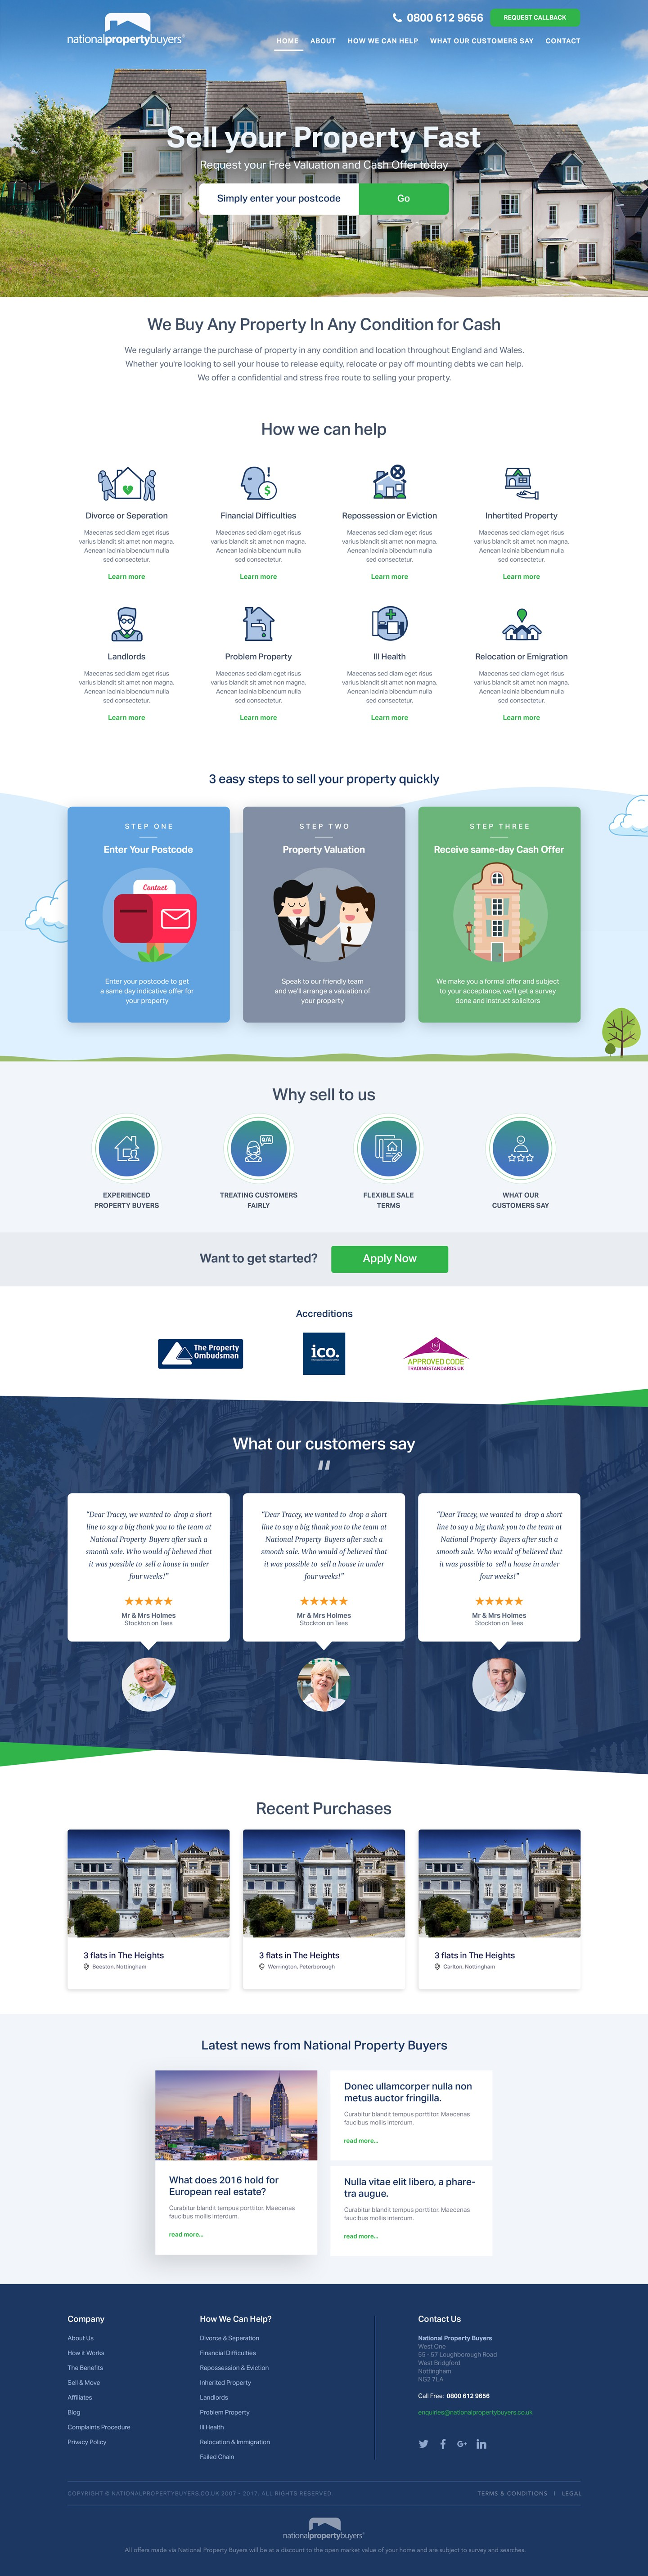 Re-design of National Property Buyers website